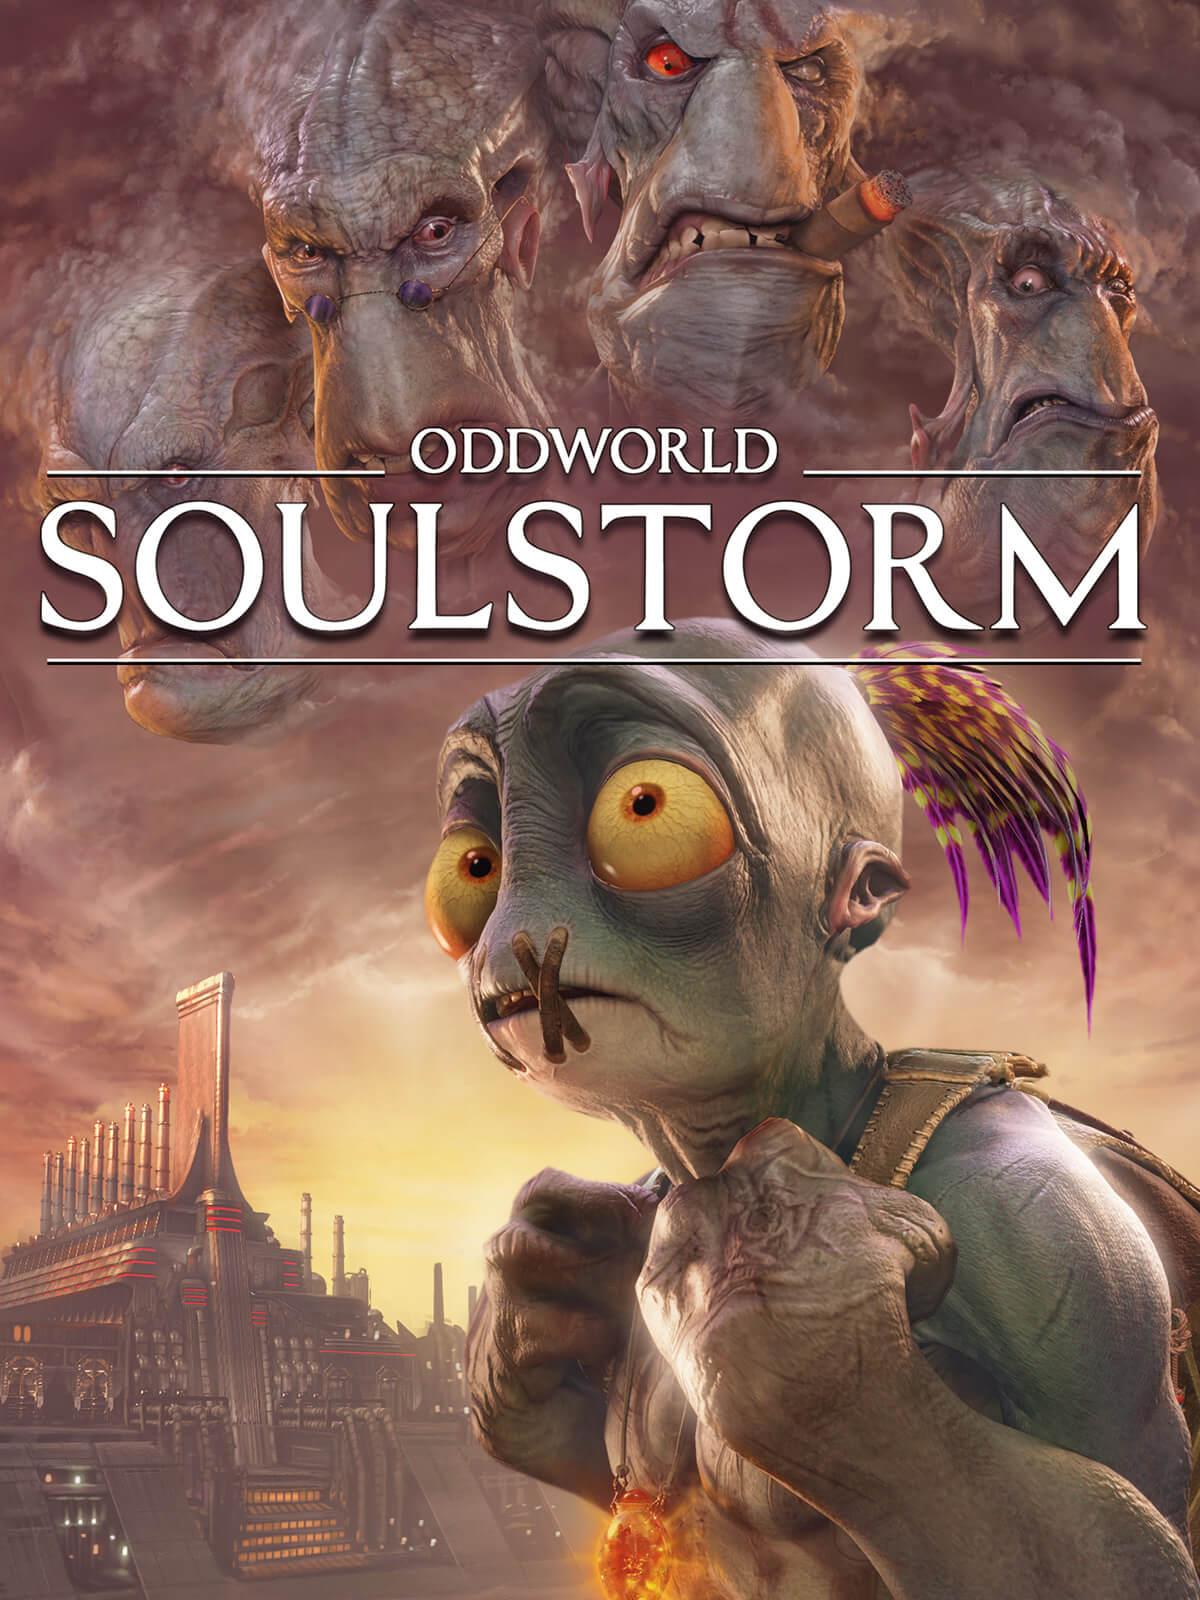 [EPIC GAMES] Oddworld: Soulstorm (Türkei VPN)